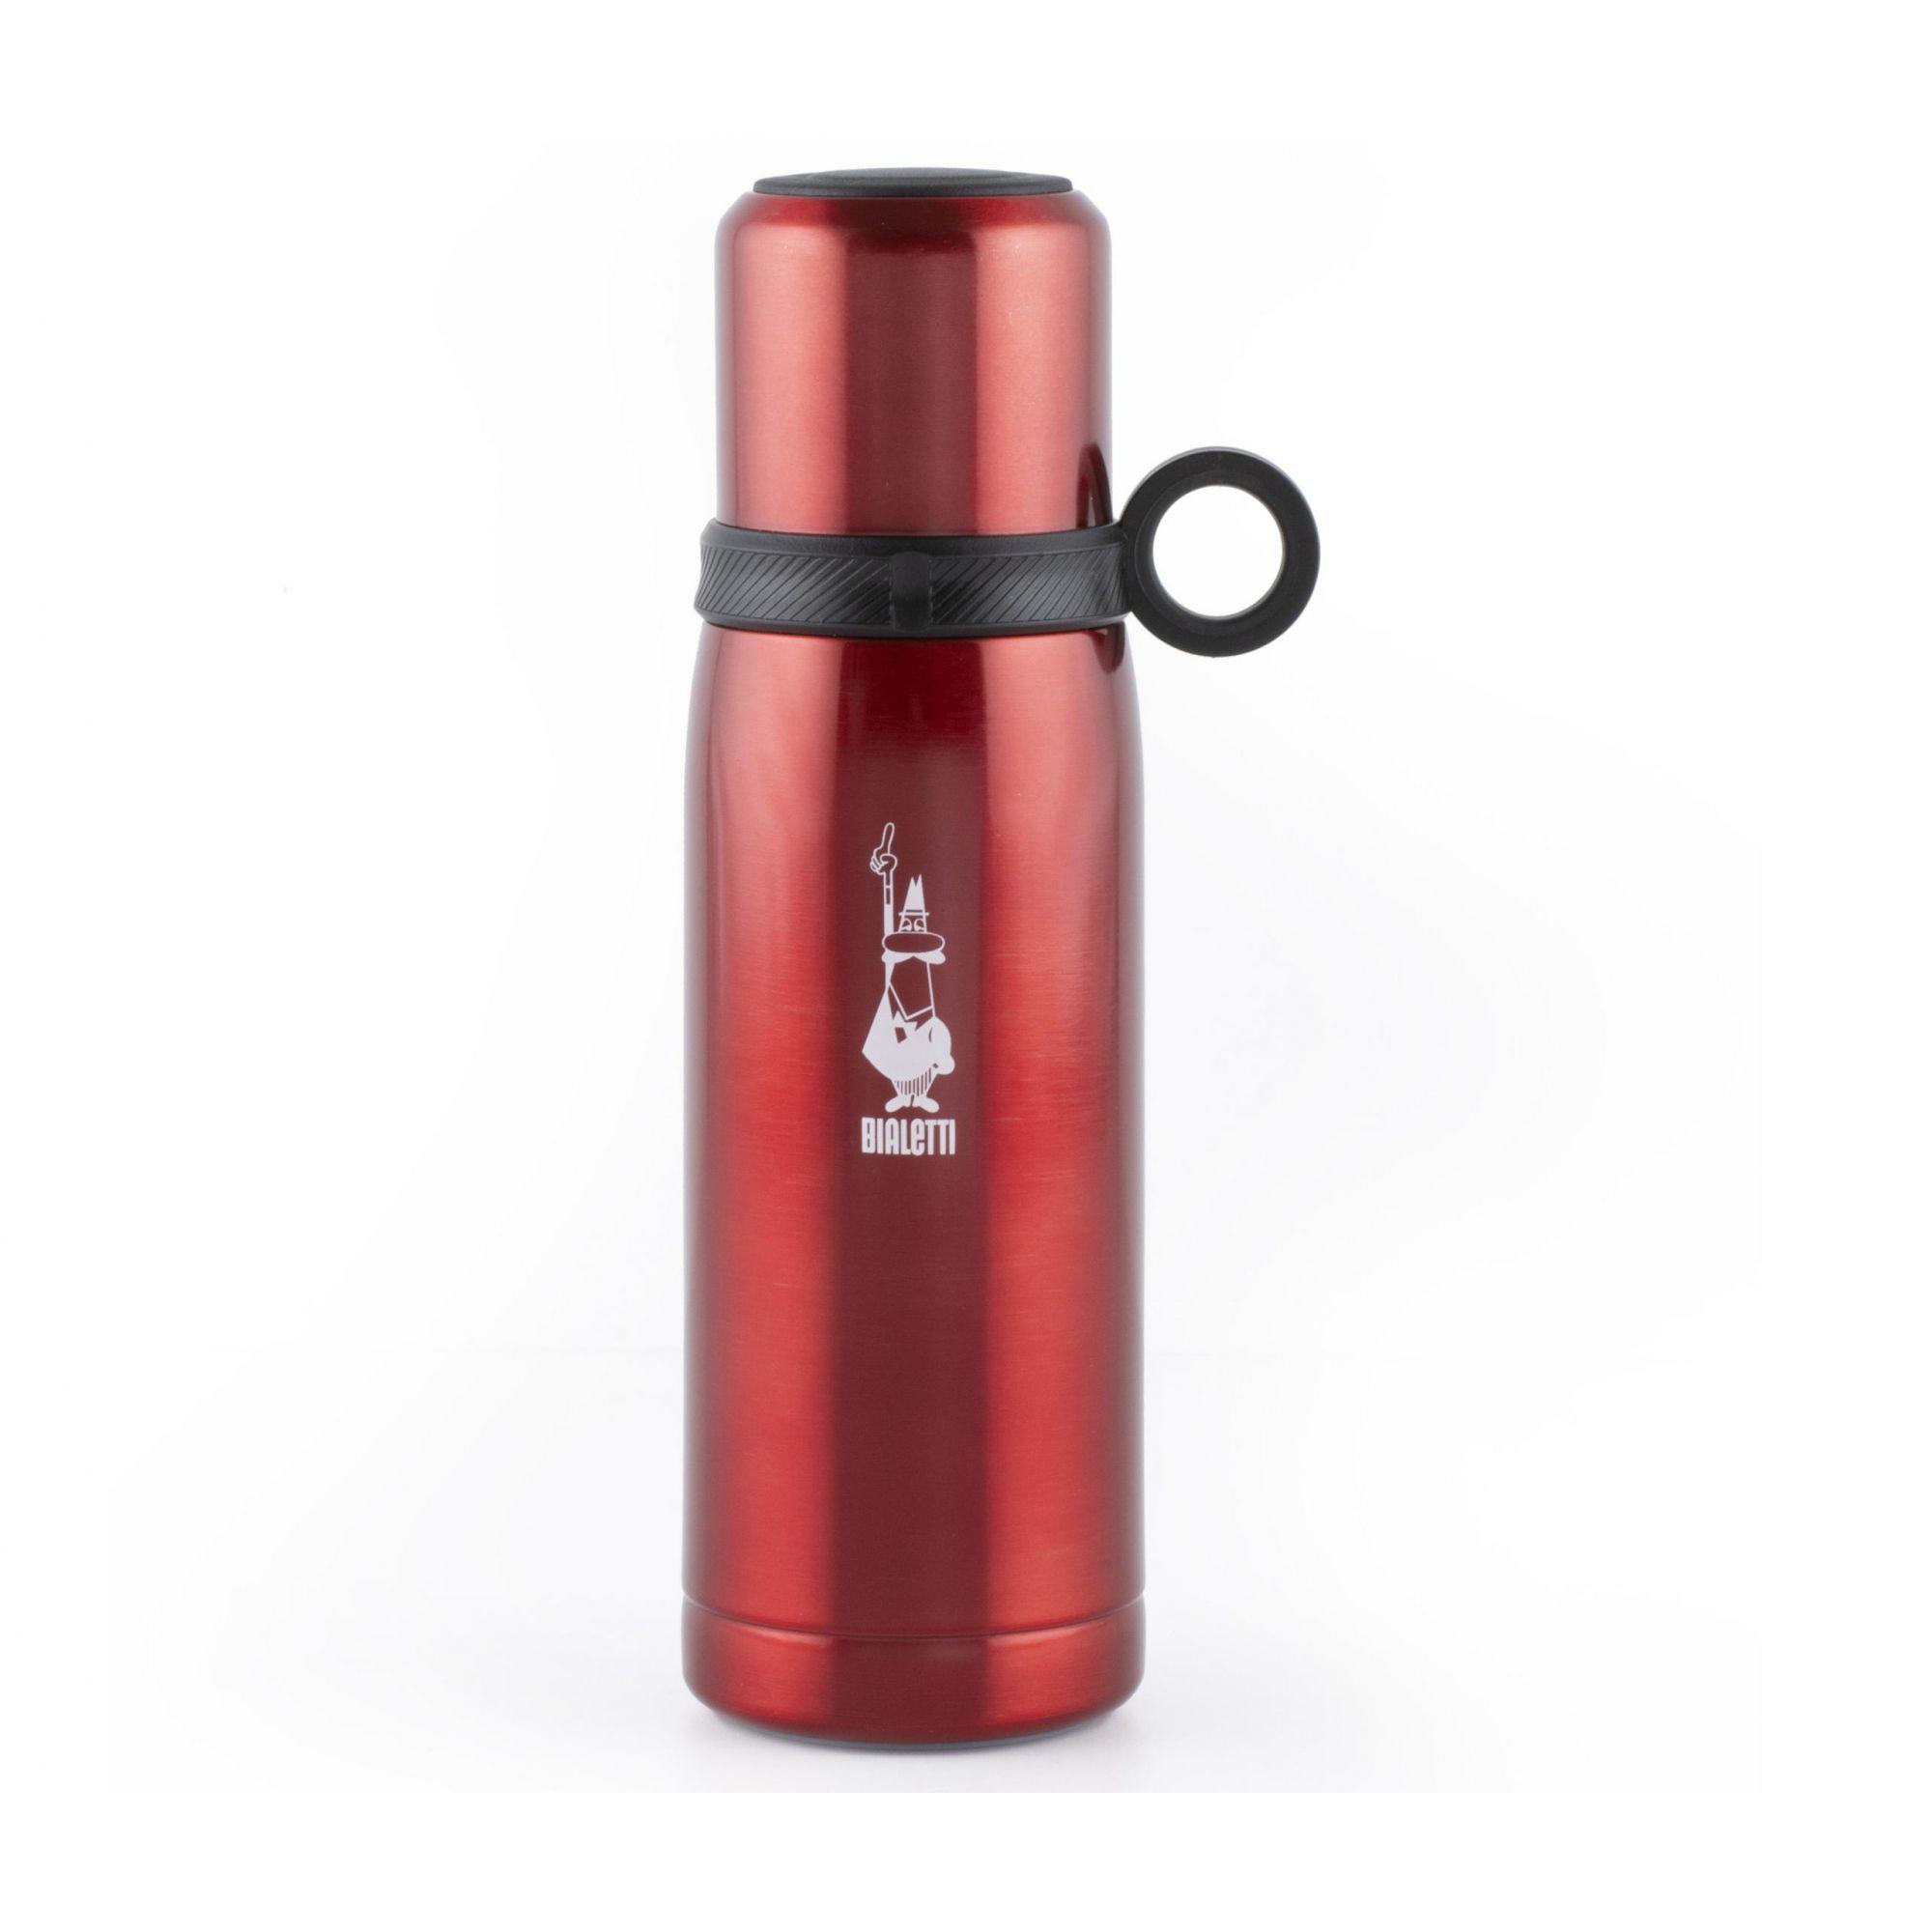 Garrafa Térmica Vermelha 460 ml - Aço Inox